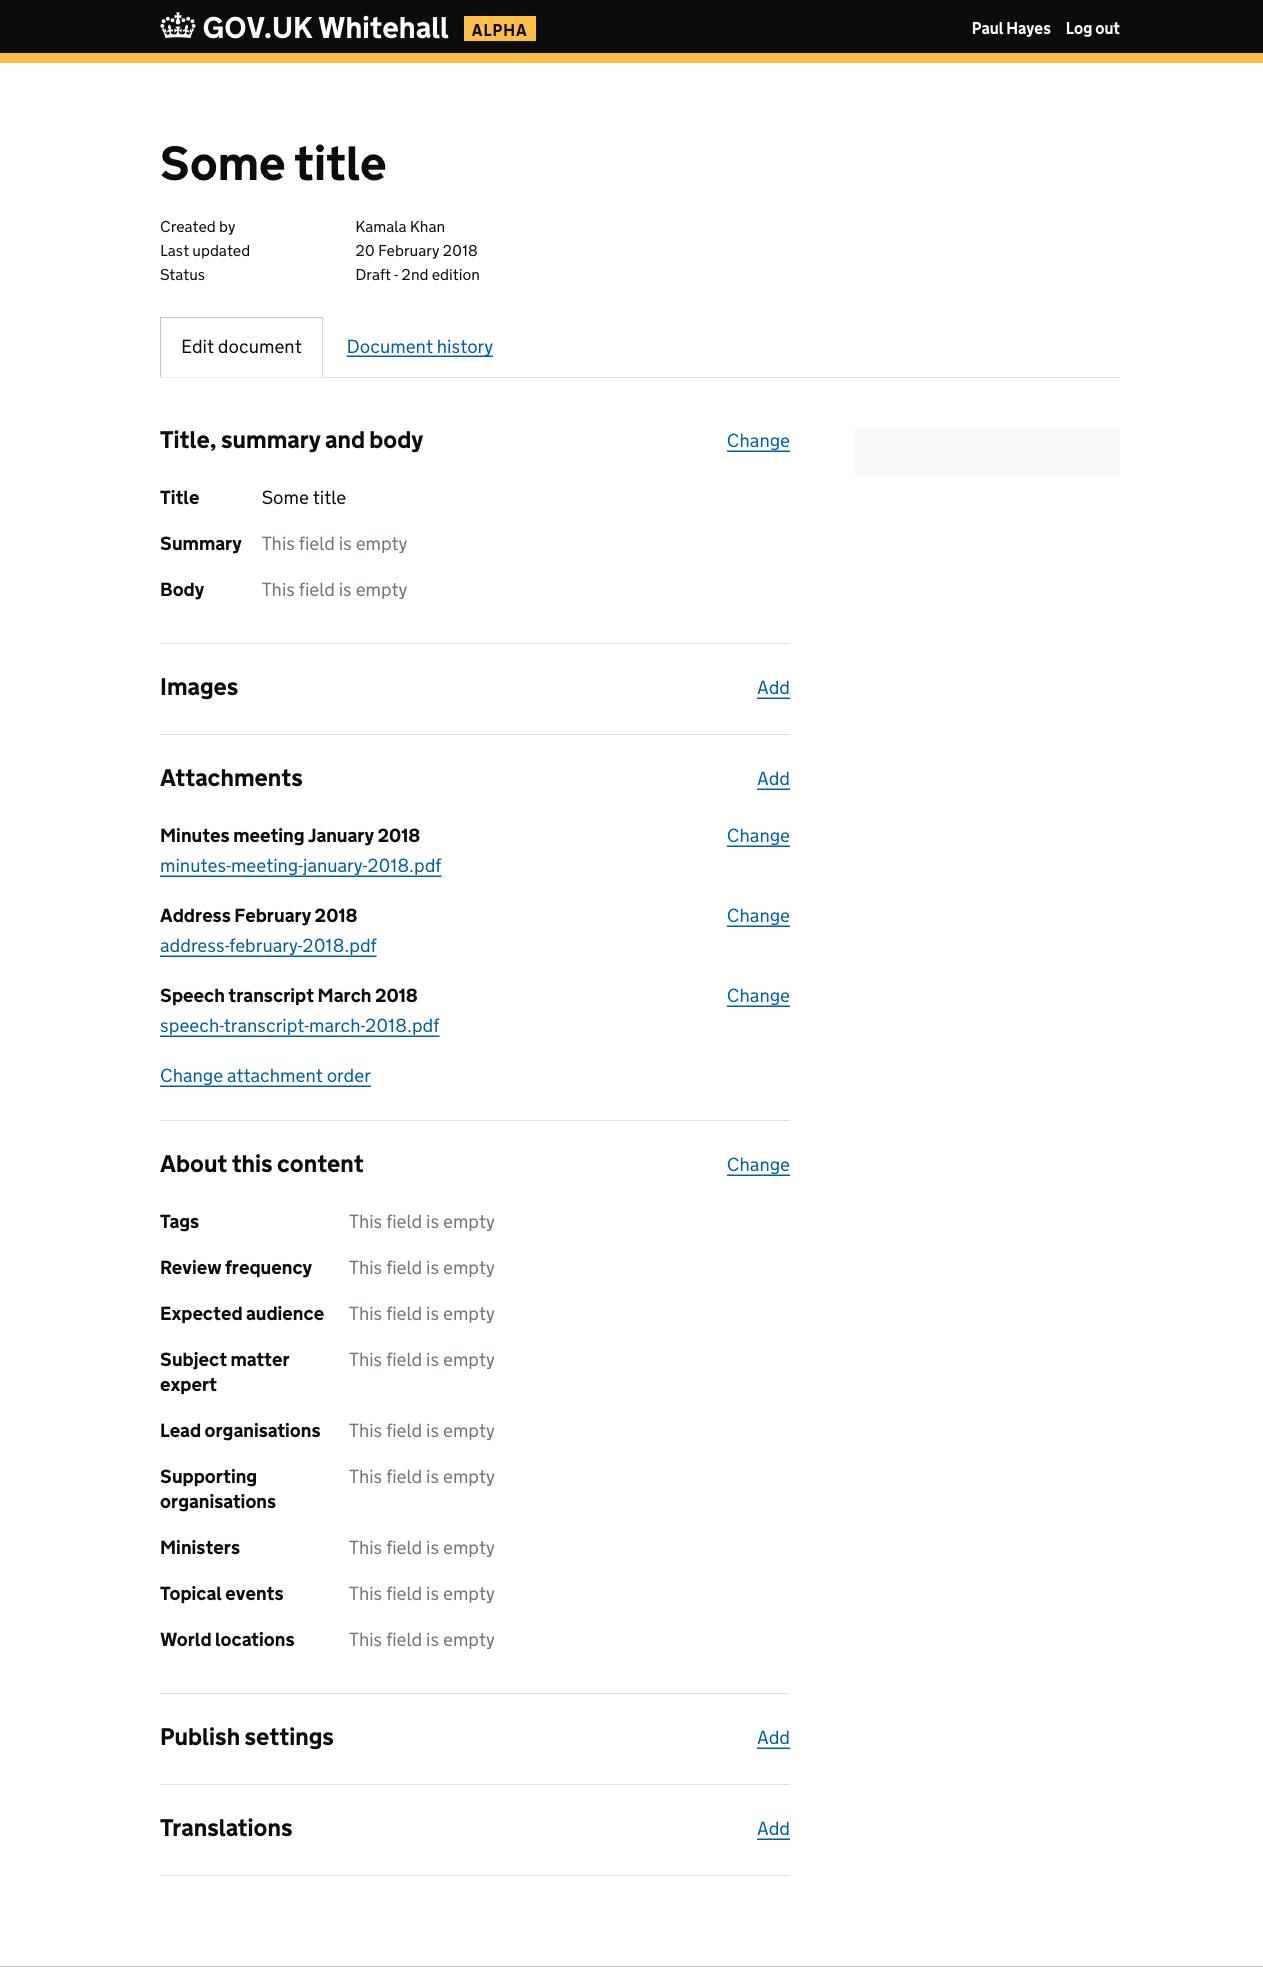 document-tasks-attachments